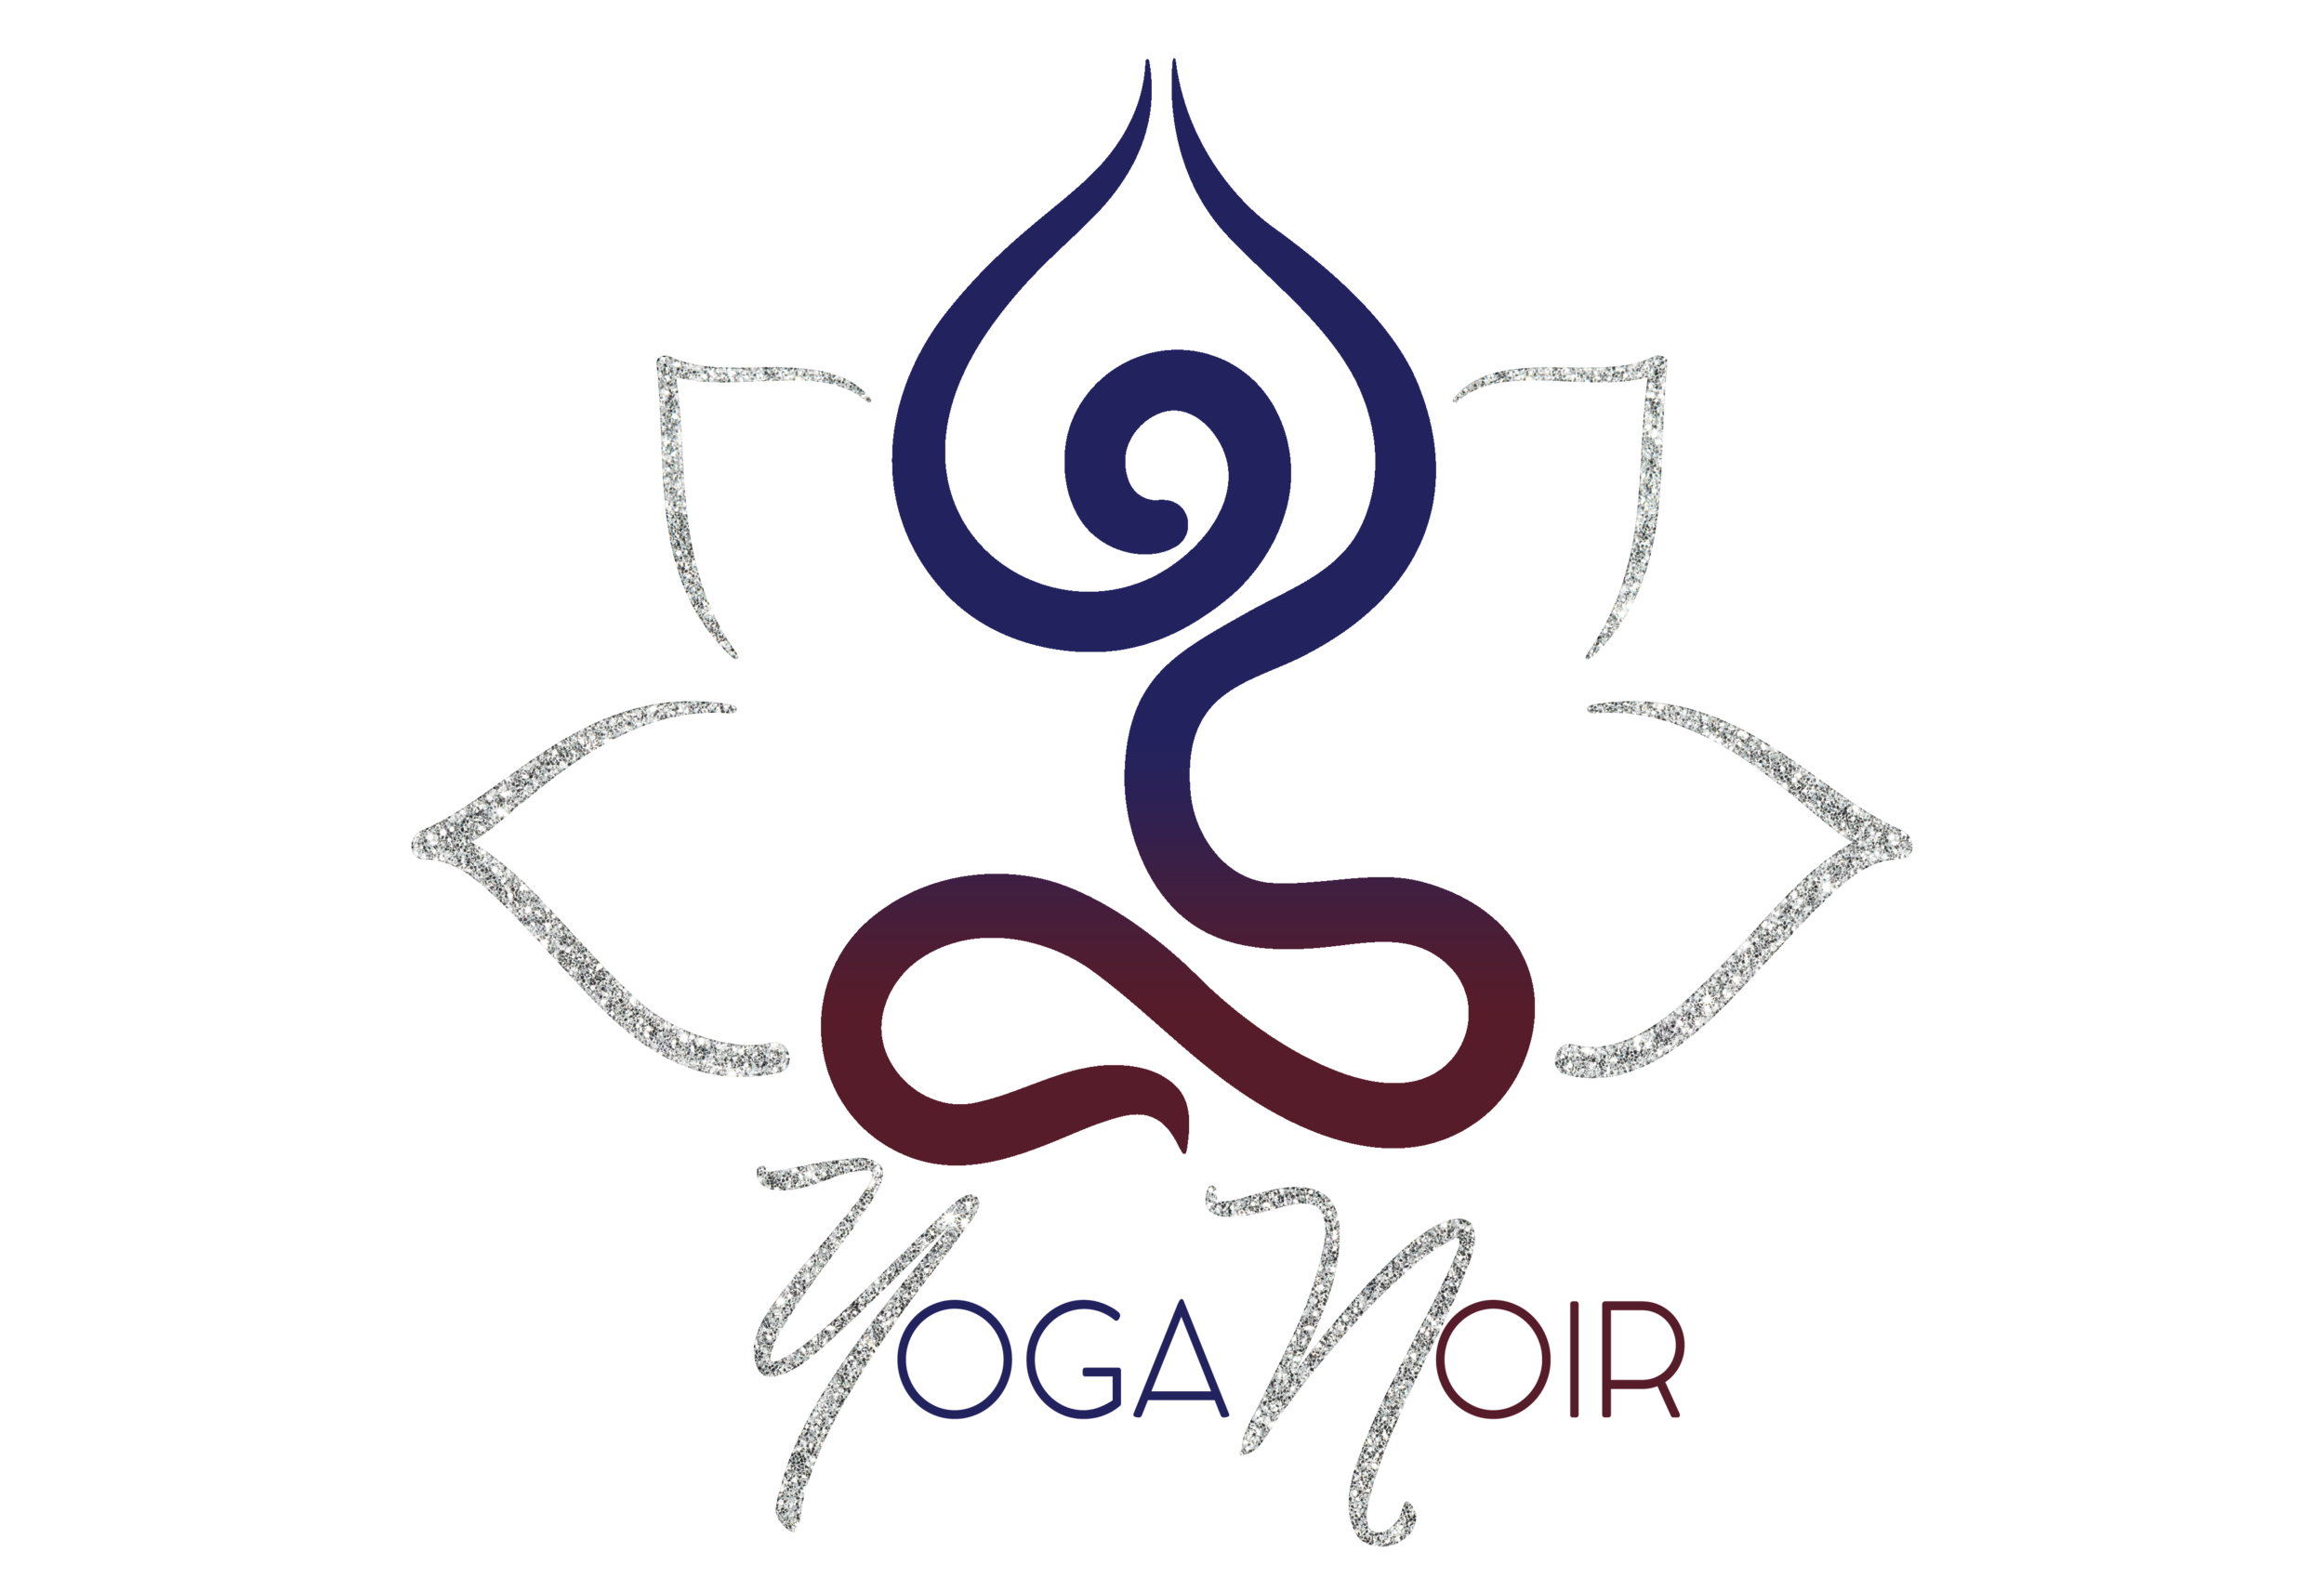 Yoga Noir.PNG